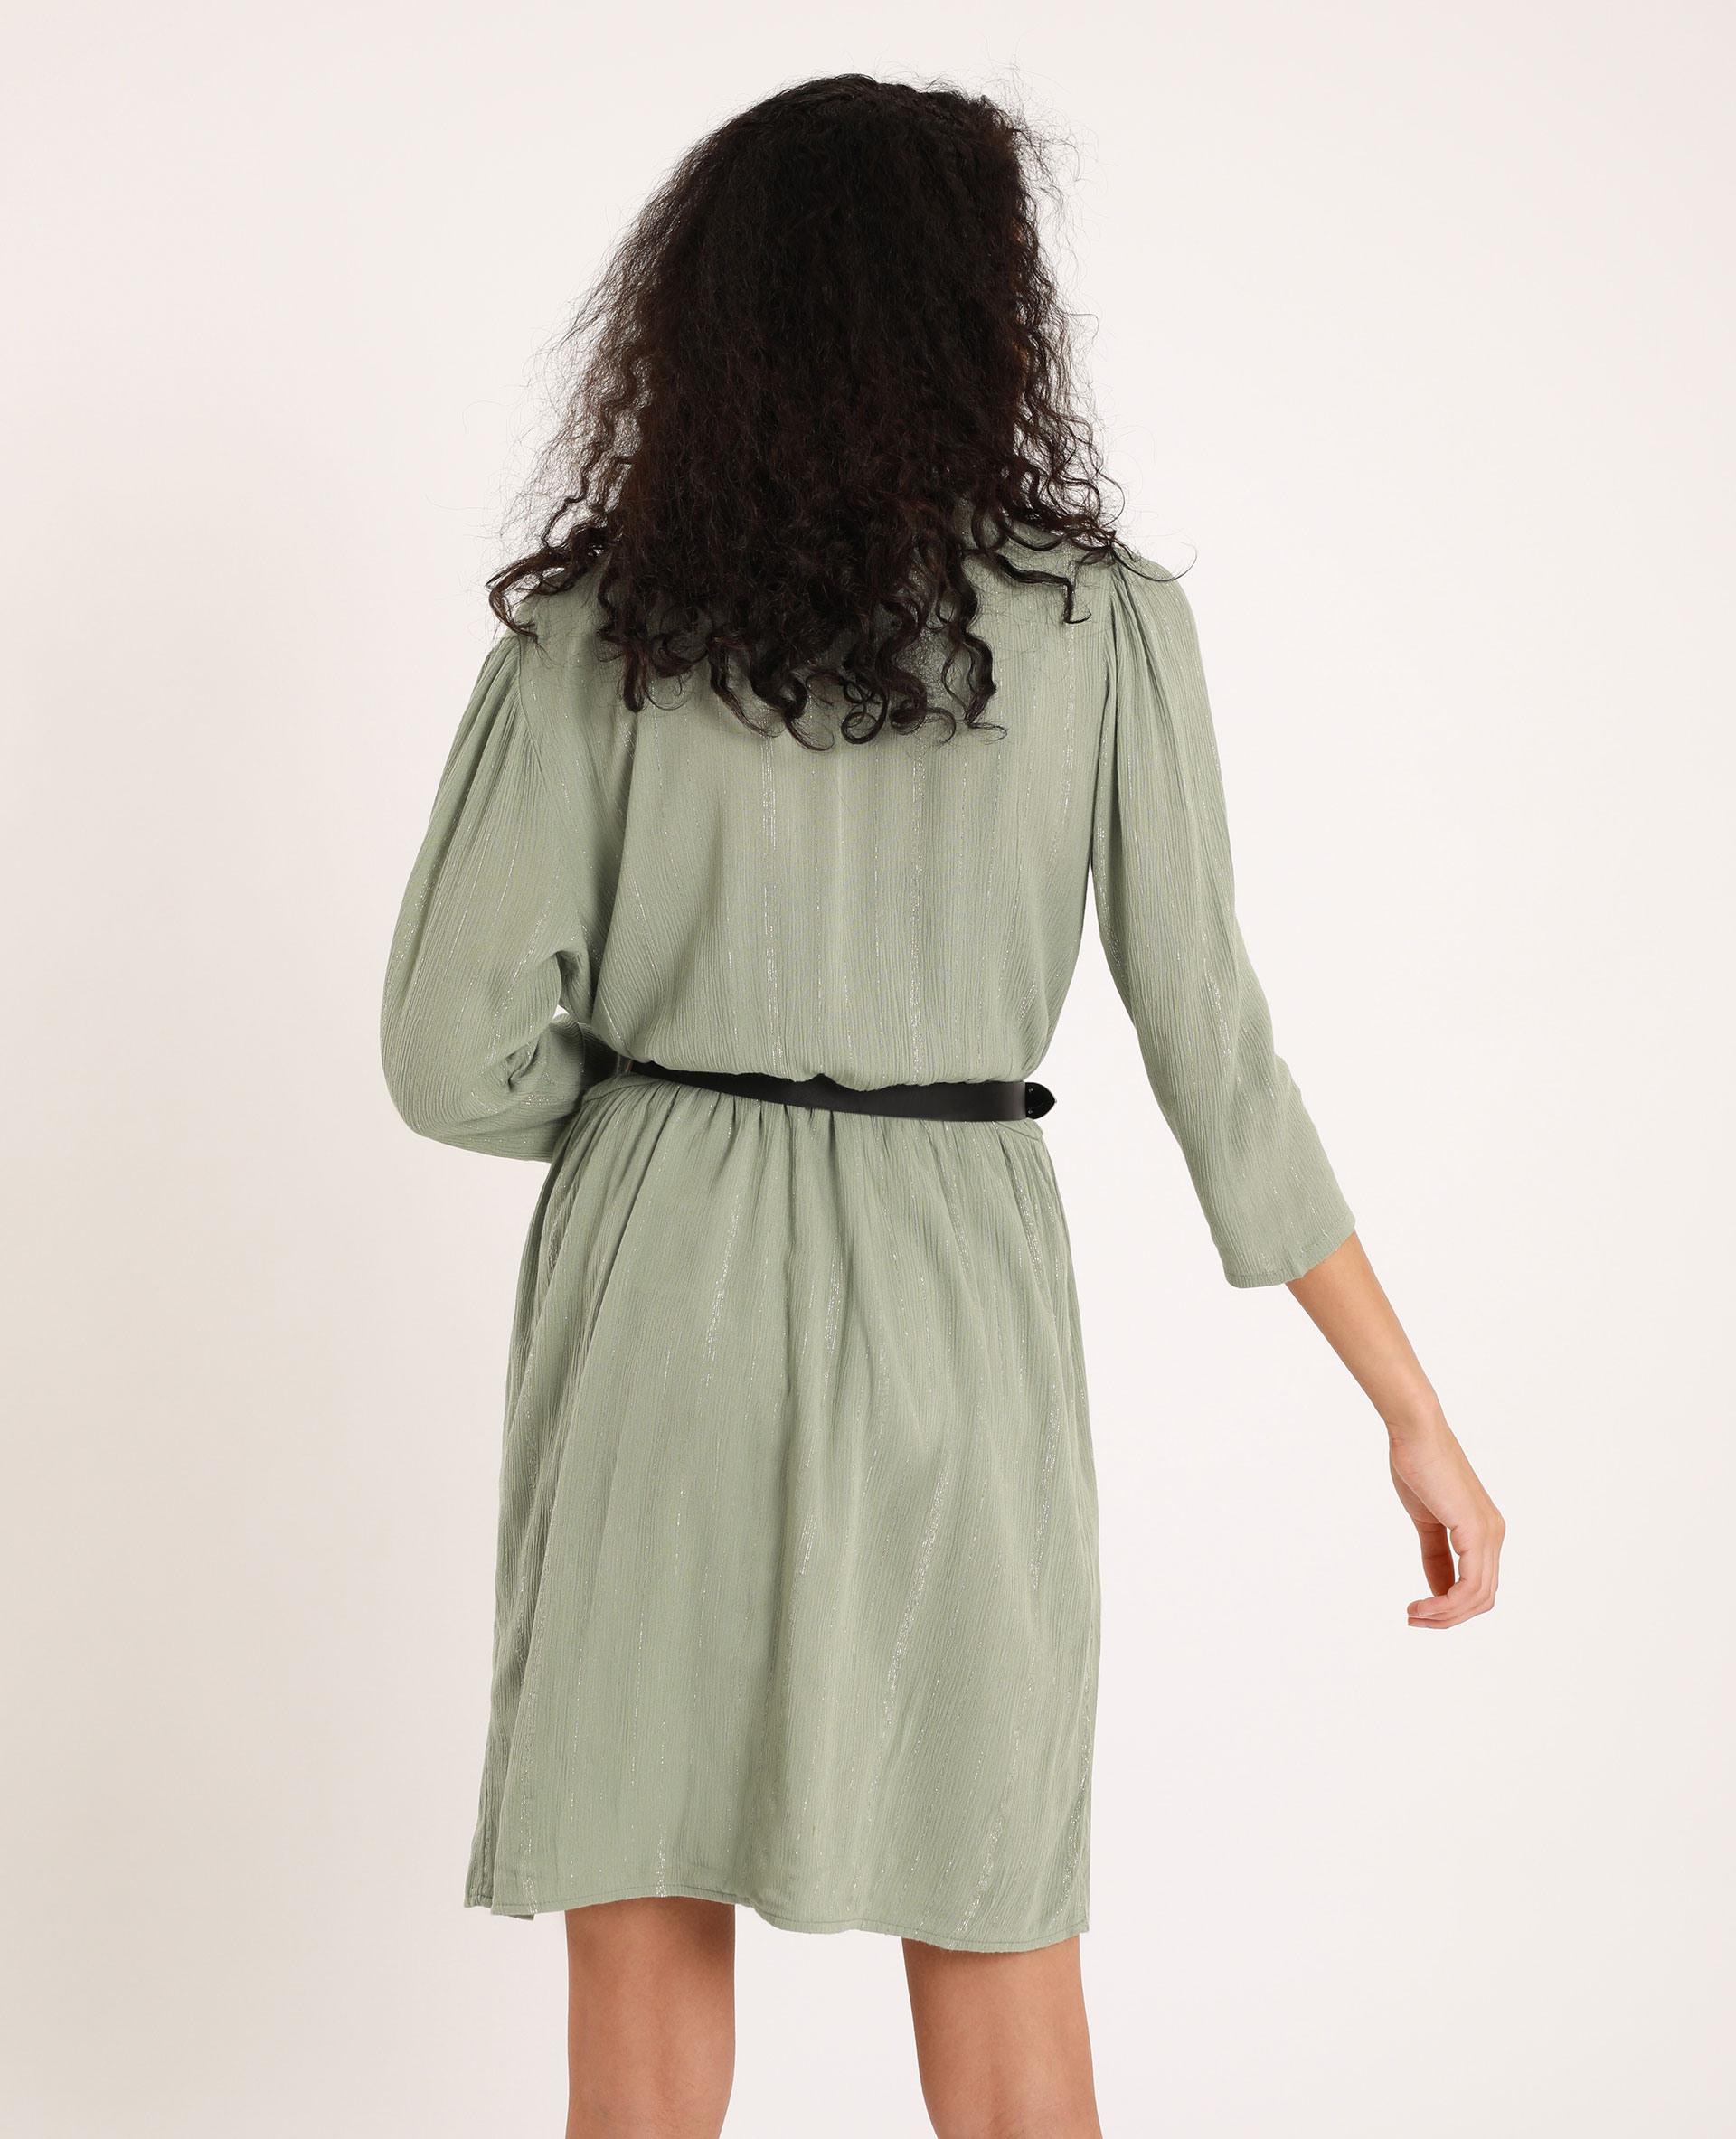 Kleid In Wickeloptik Grün  781429C62G09  Pimkie